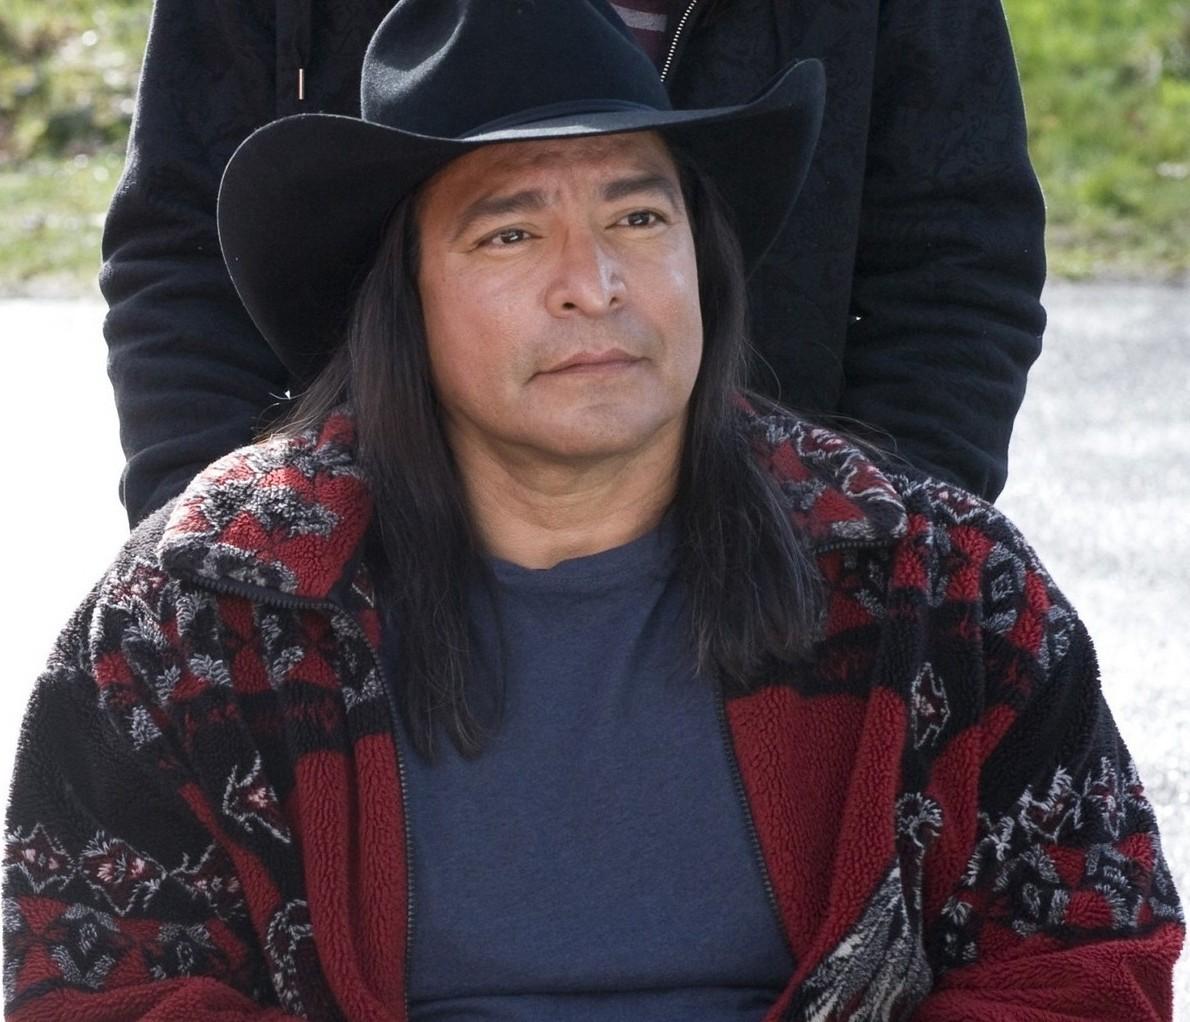 Pin by Jennifer Ratcliffe on Quileute tribe | Pinterest Jacobblack